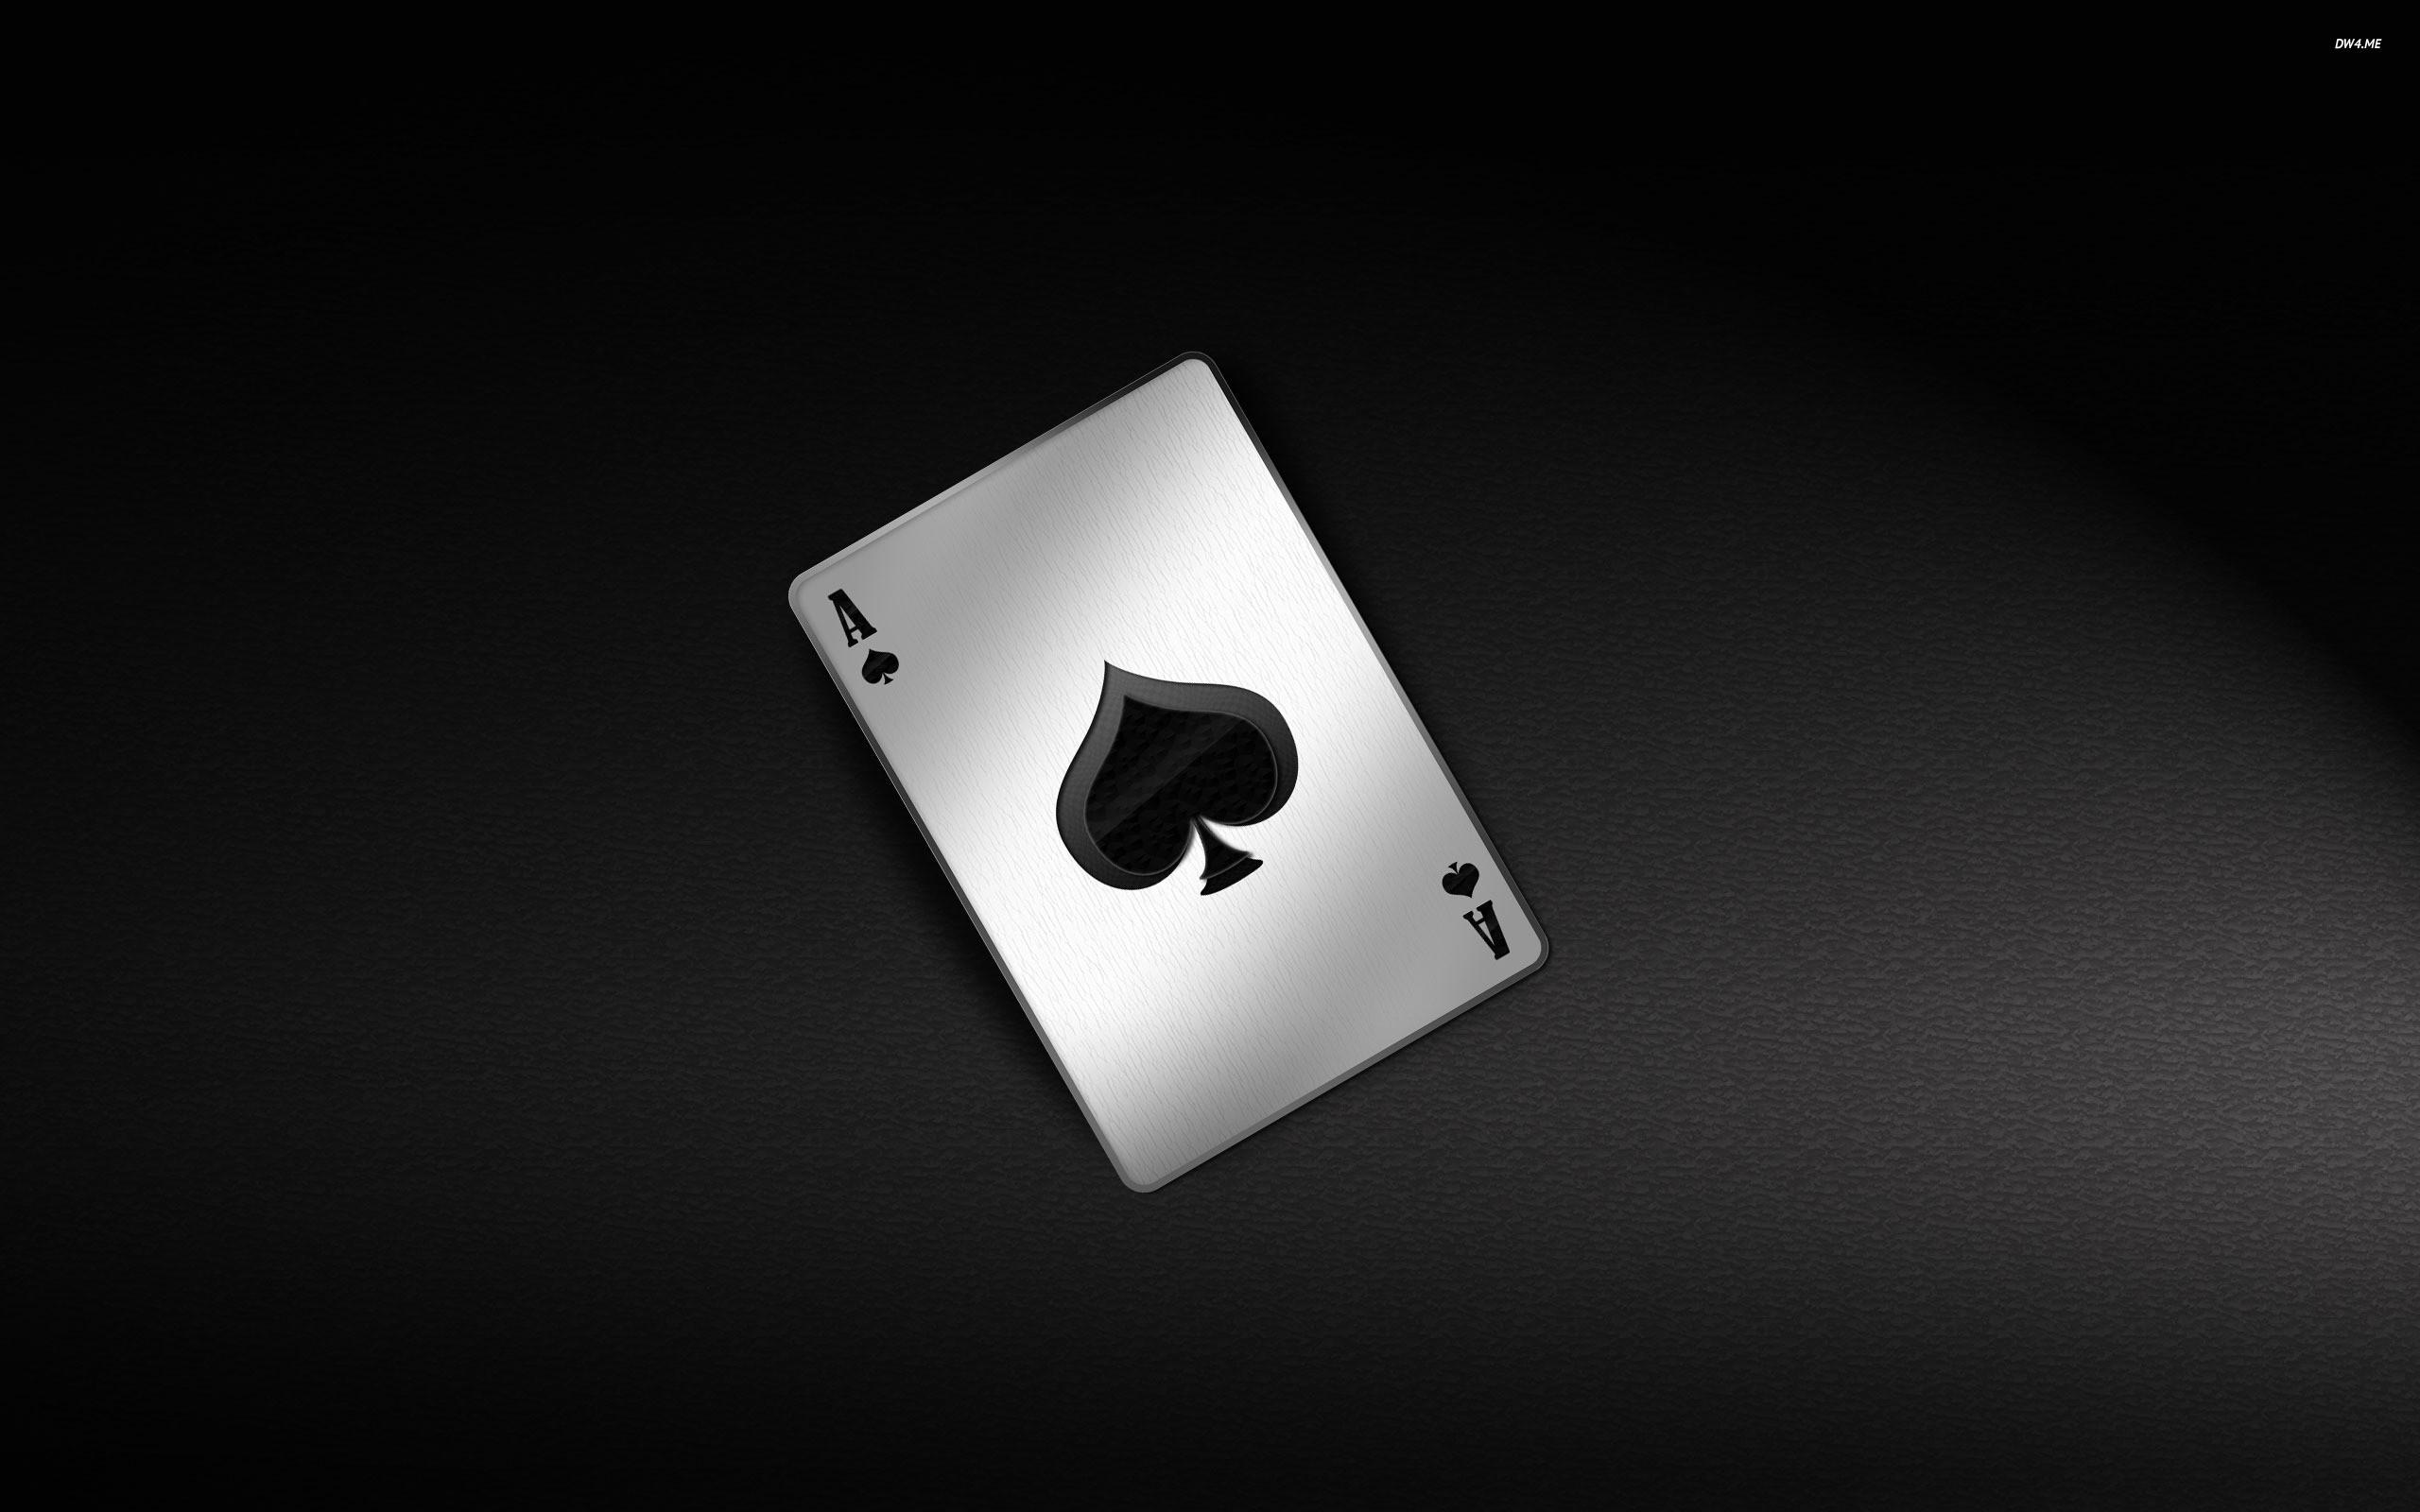 Falling In Reverse Wallpaper 1366x768 Joker Card Wallpapers 66 Images